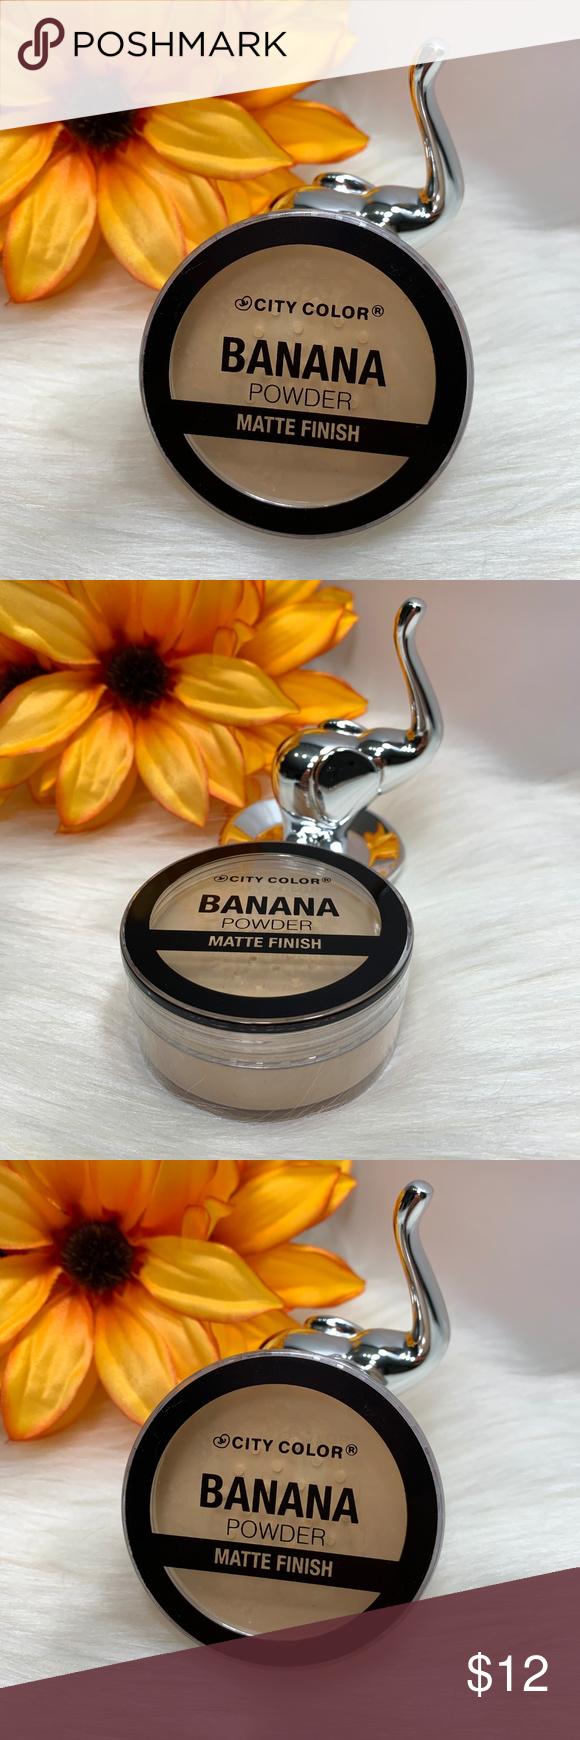 City Color Banana Powder Matte Finish 0.409 oz • Apply